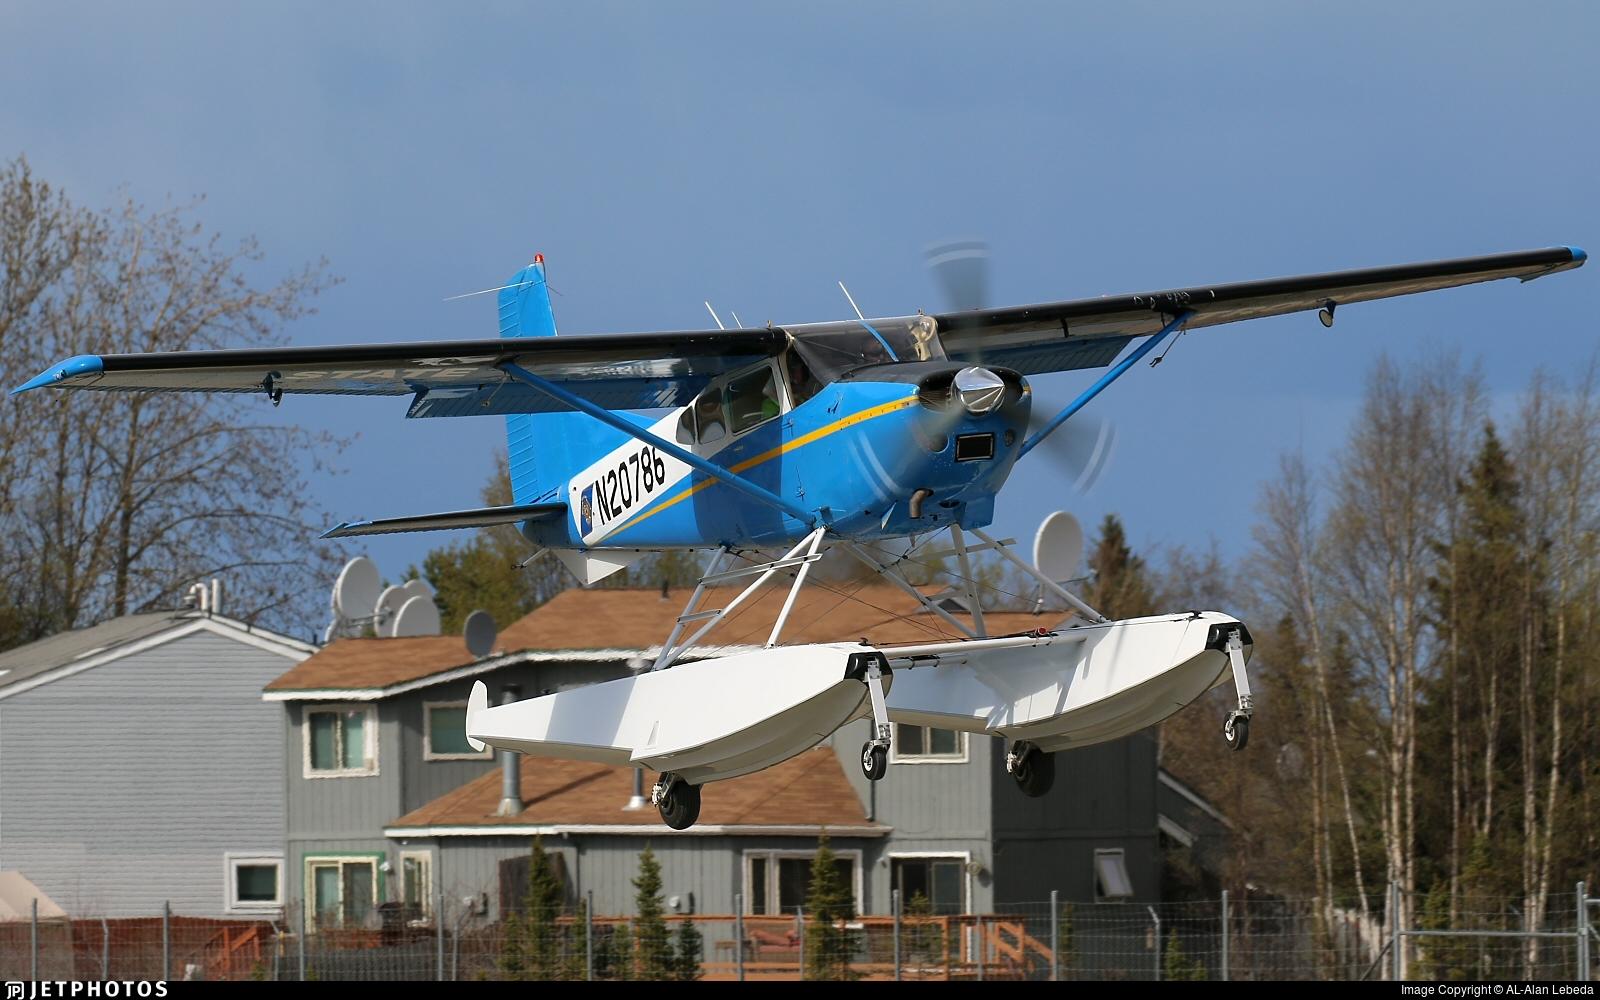 N20786 - Cessna A185F Skywagon - United States - State of Alaska